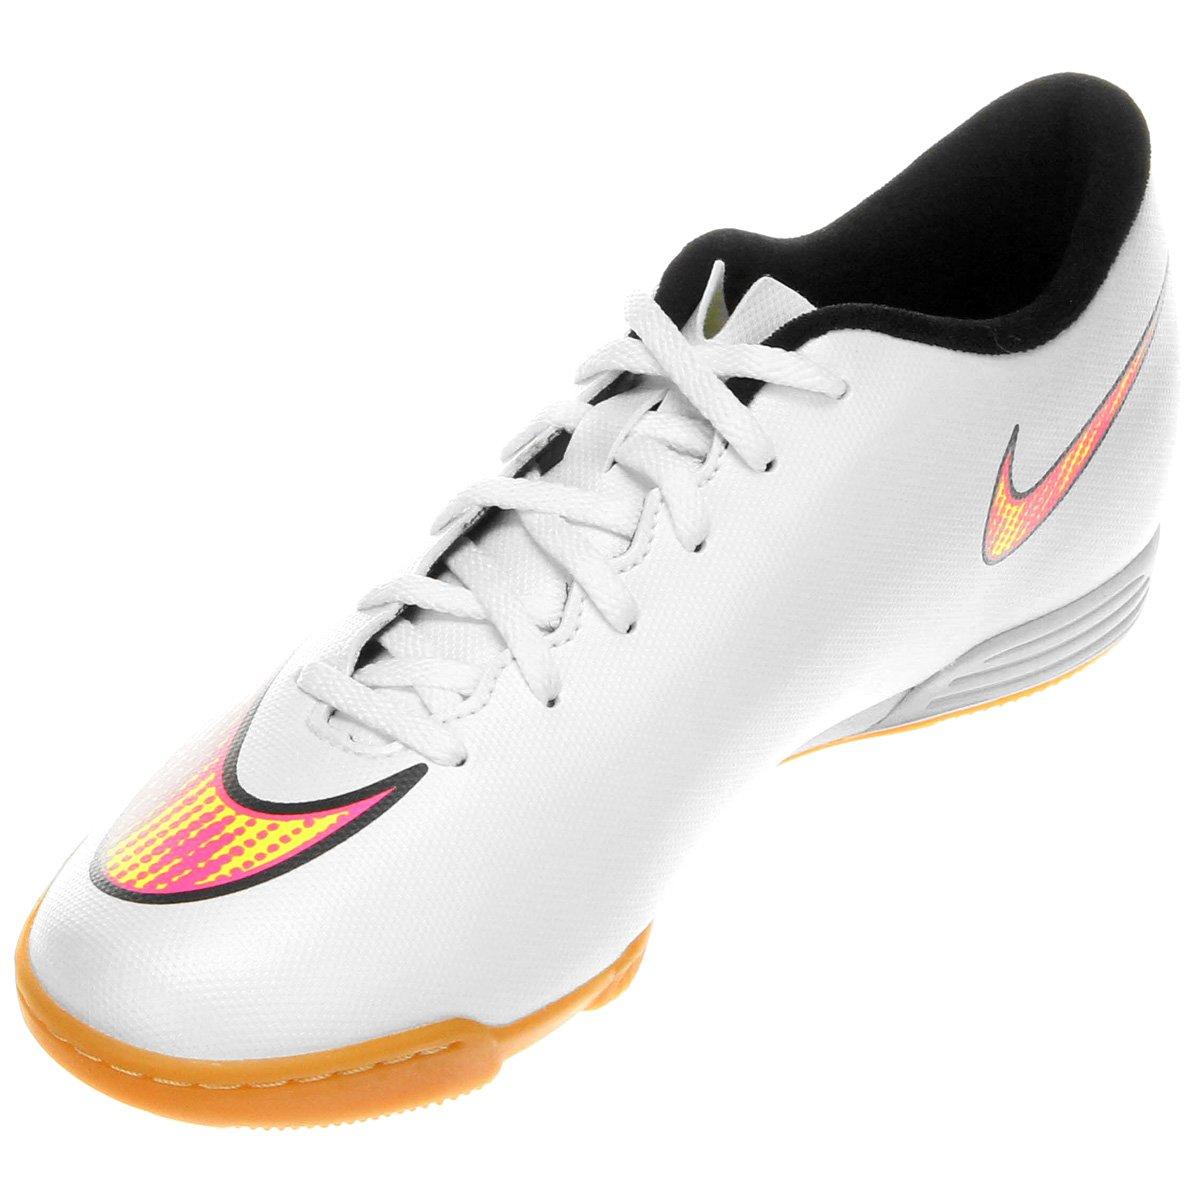 658126f67875c Chuteira Futsal Nike Mercurial Vortex 2 IC - Compre Agora   Netshoes